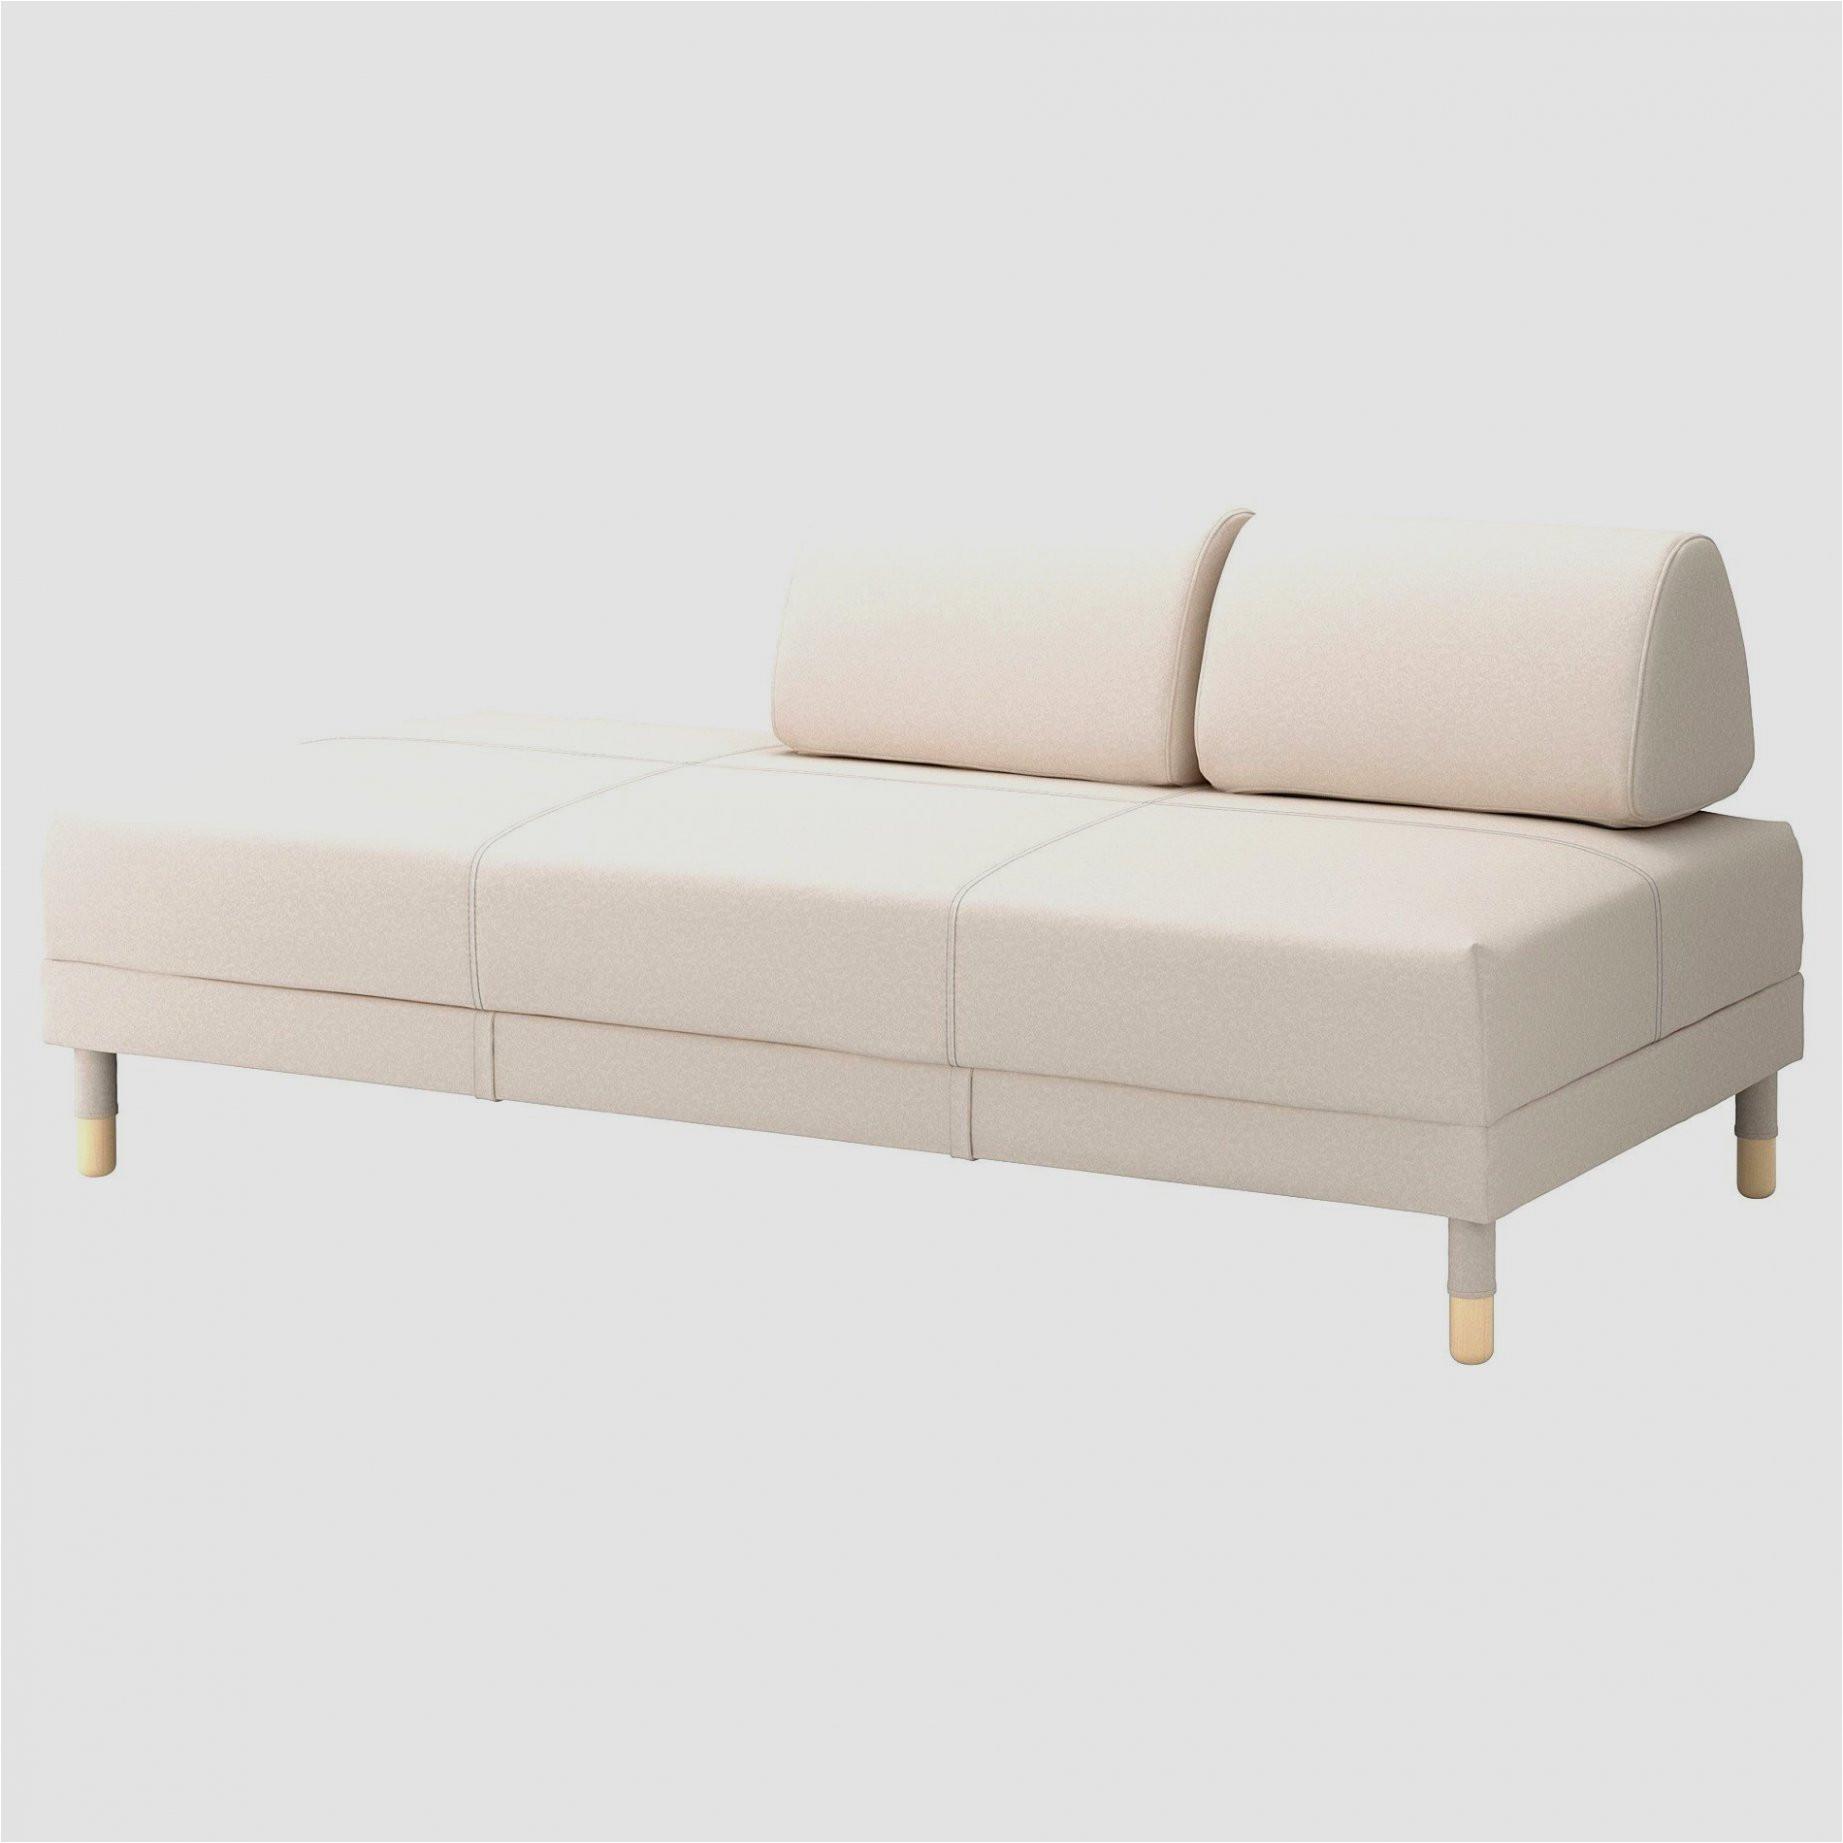 sofa cheslong bonito kinderzimmer schlafsofa luxus ikea jugendzimmer komplett luxus